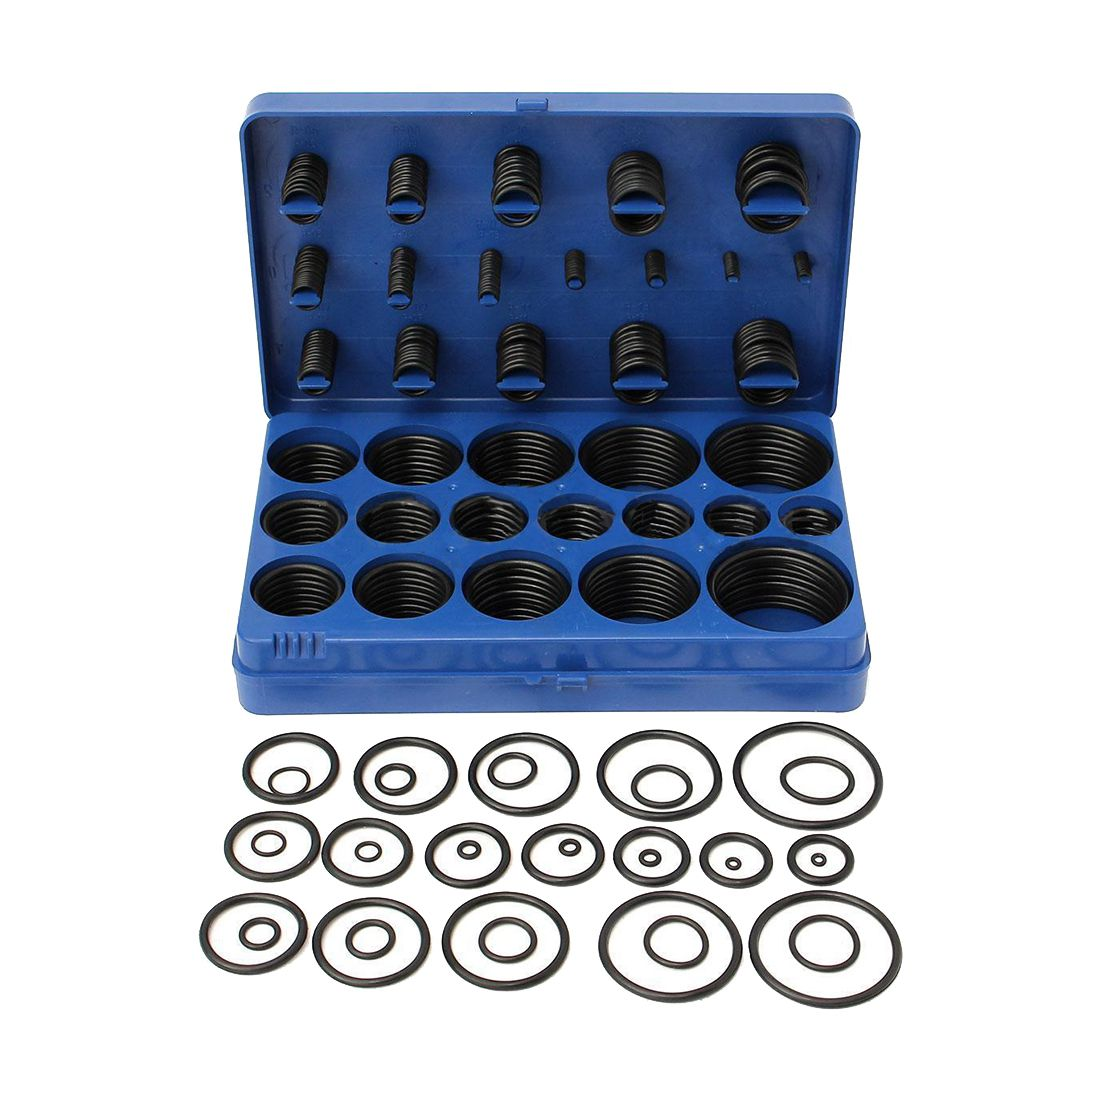 Kit 419Pcs O-Ring O-Ring Black Rubber 32 Sizes With Case 3-50mm все цены